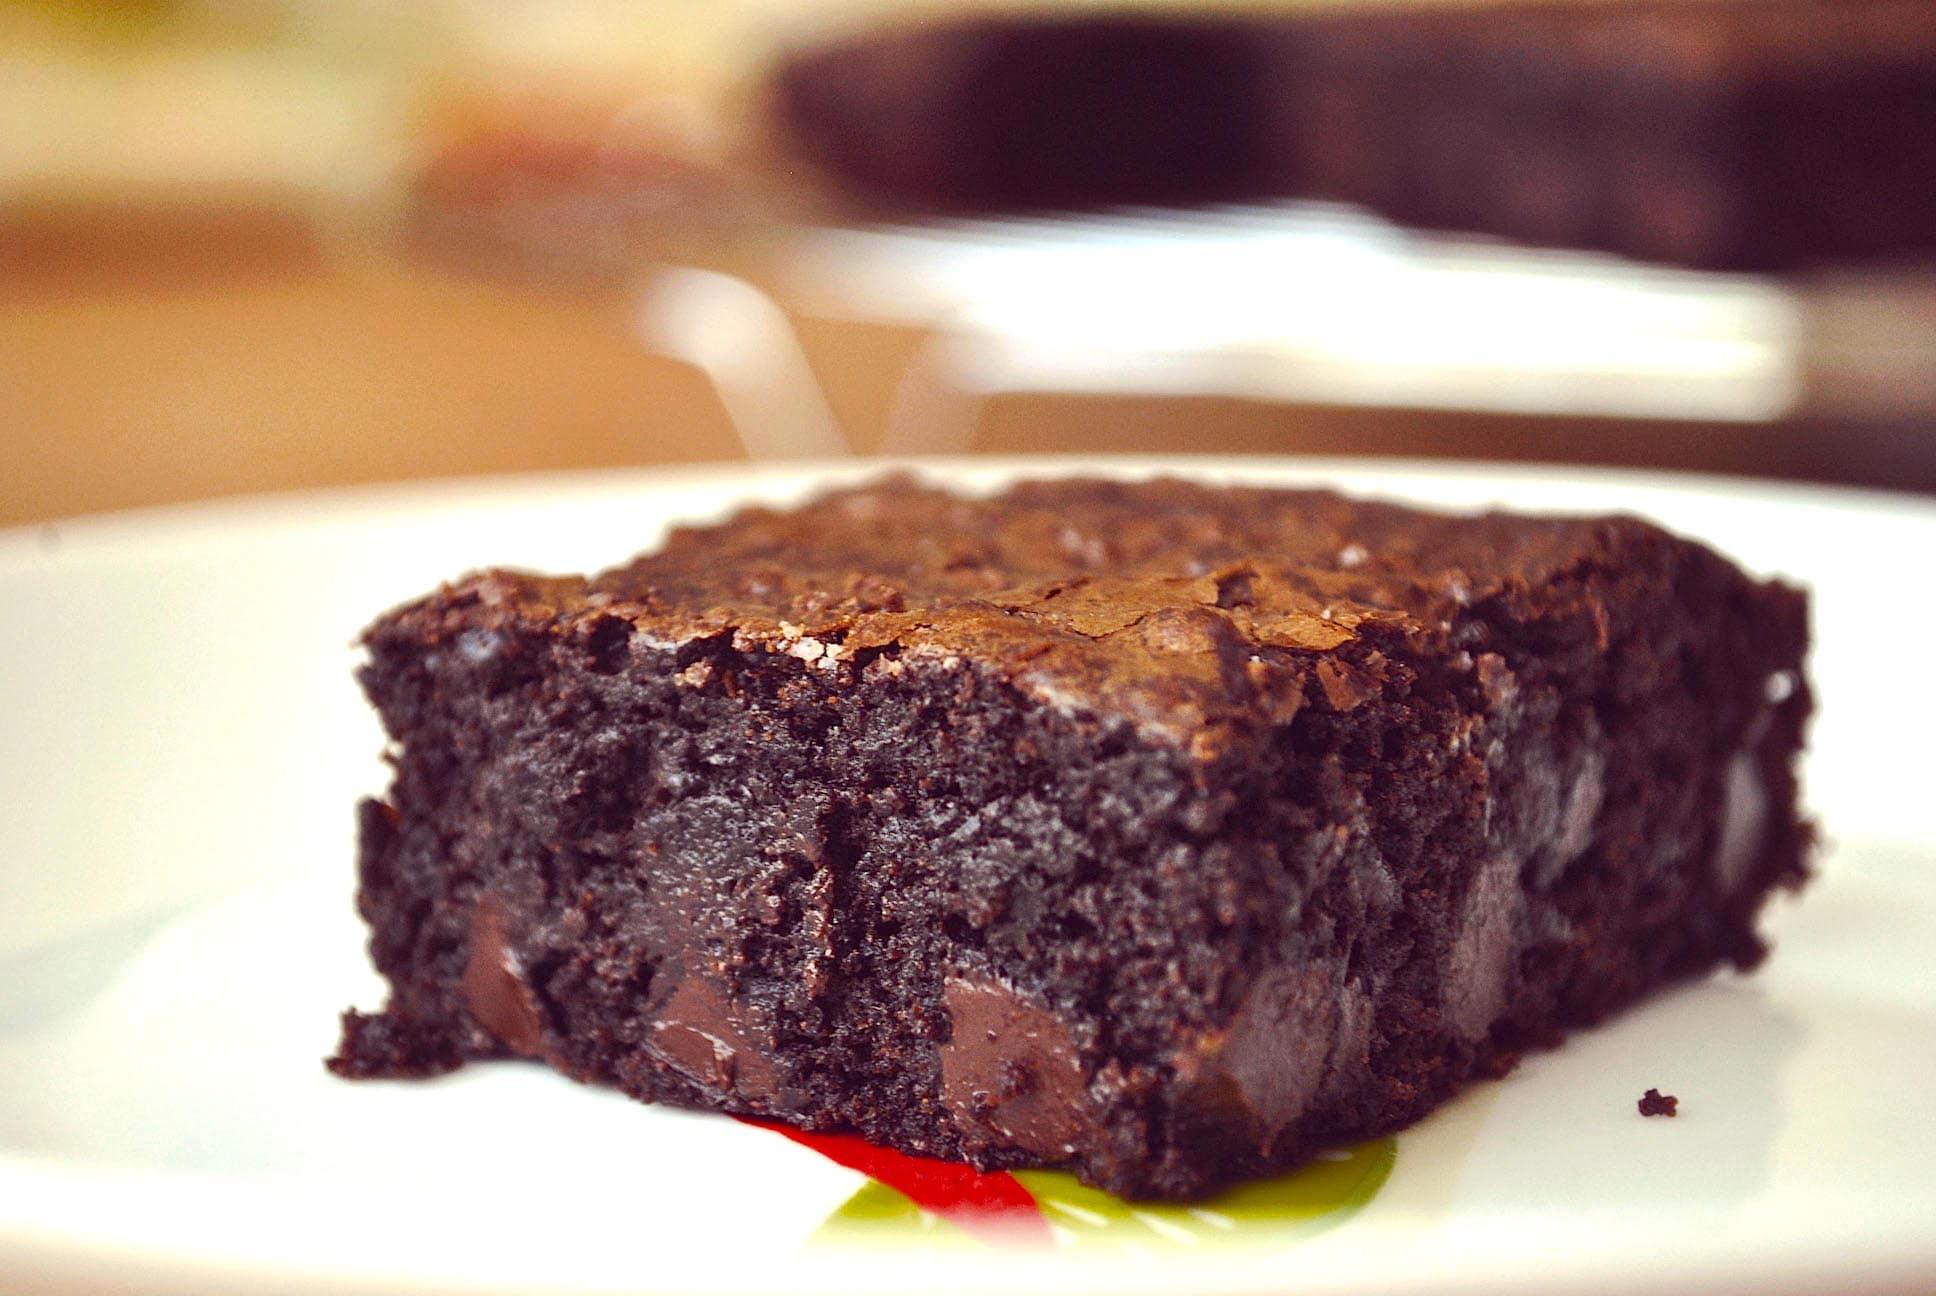 The Hirshon Frangelico Brownie